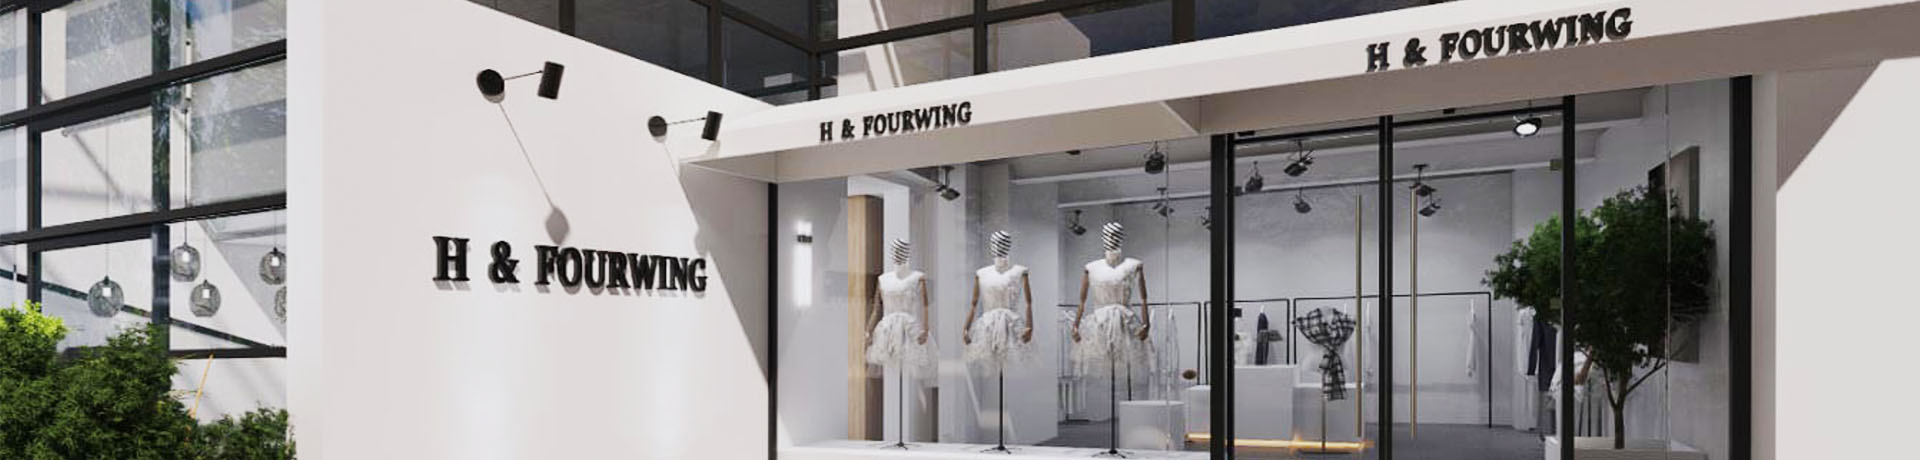 Women's Clothing Manufacturer H&Fourwing